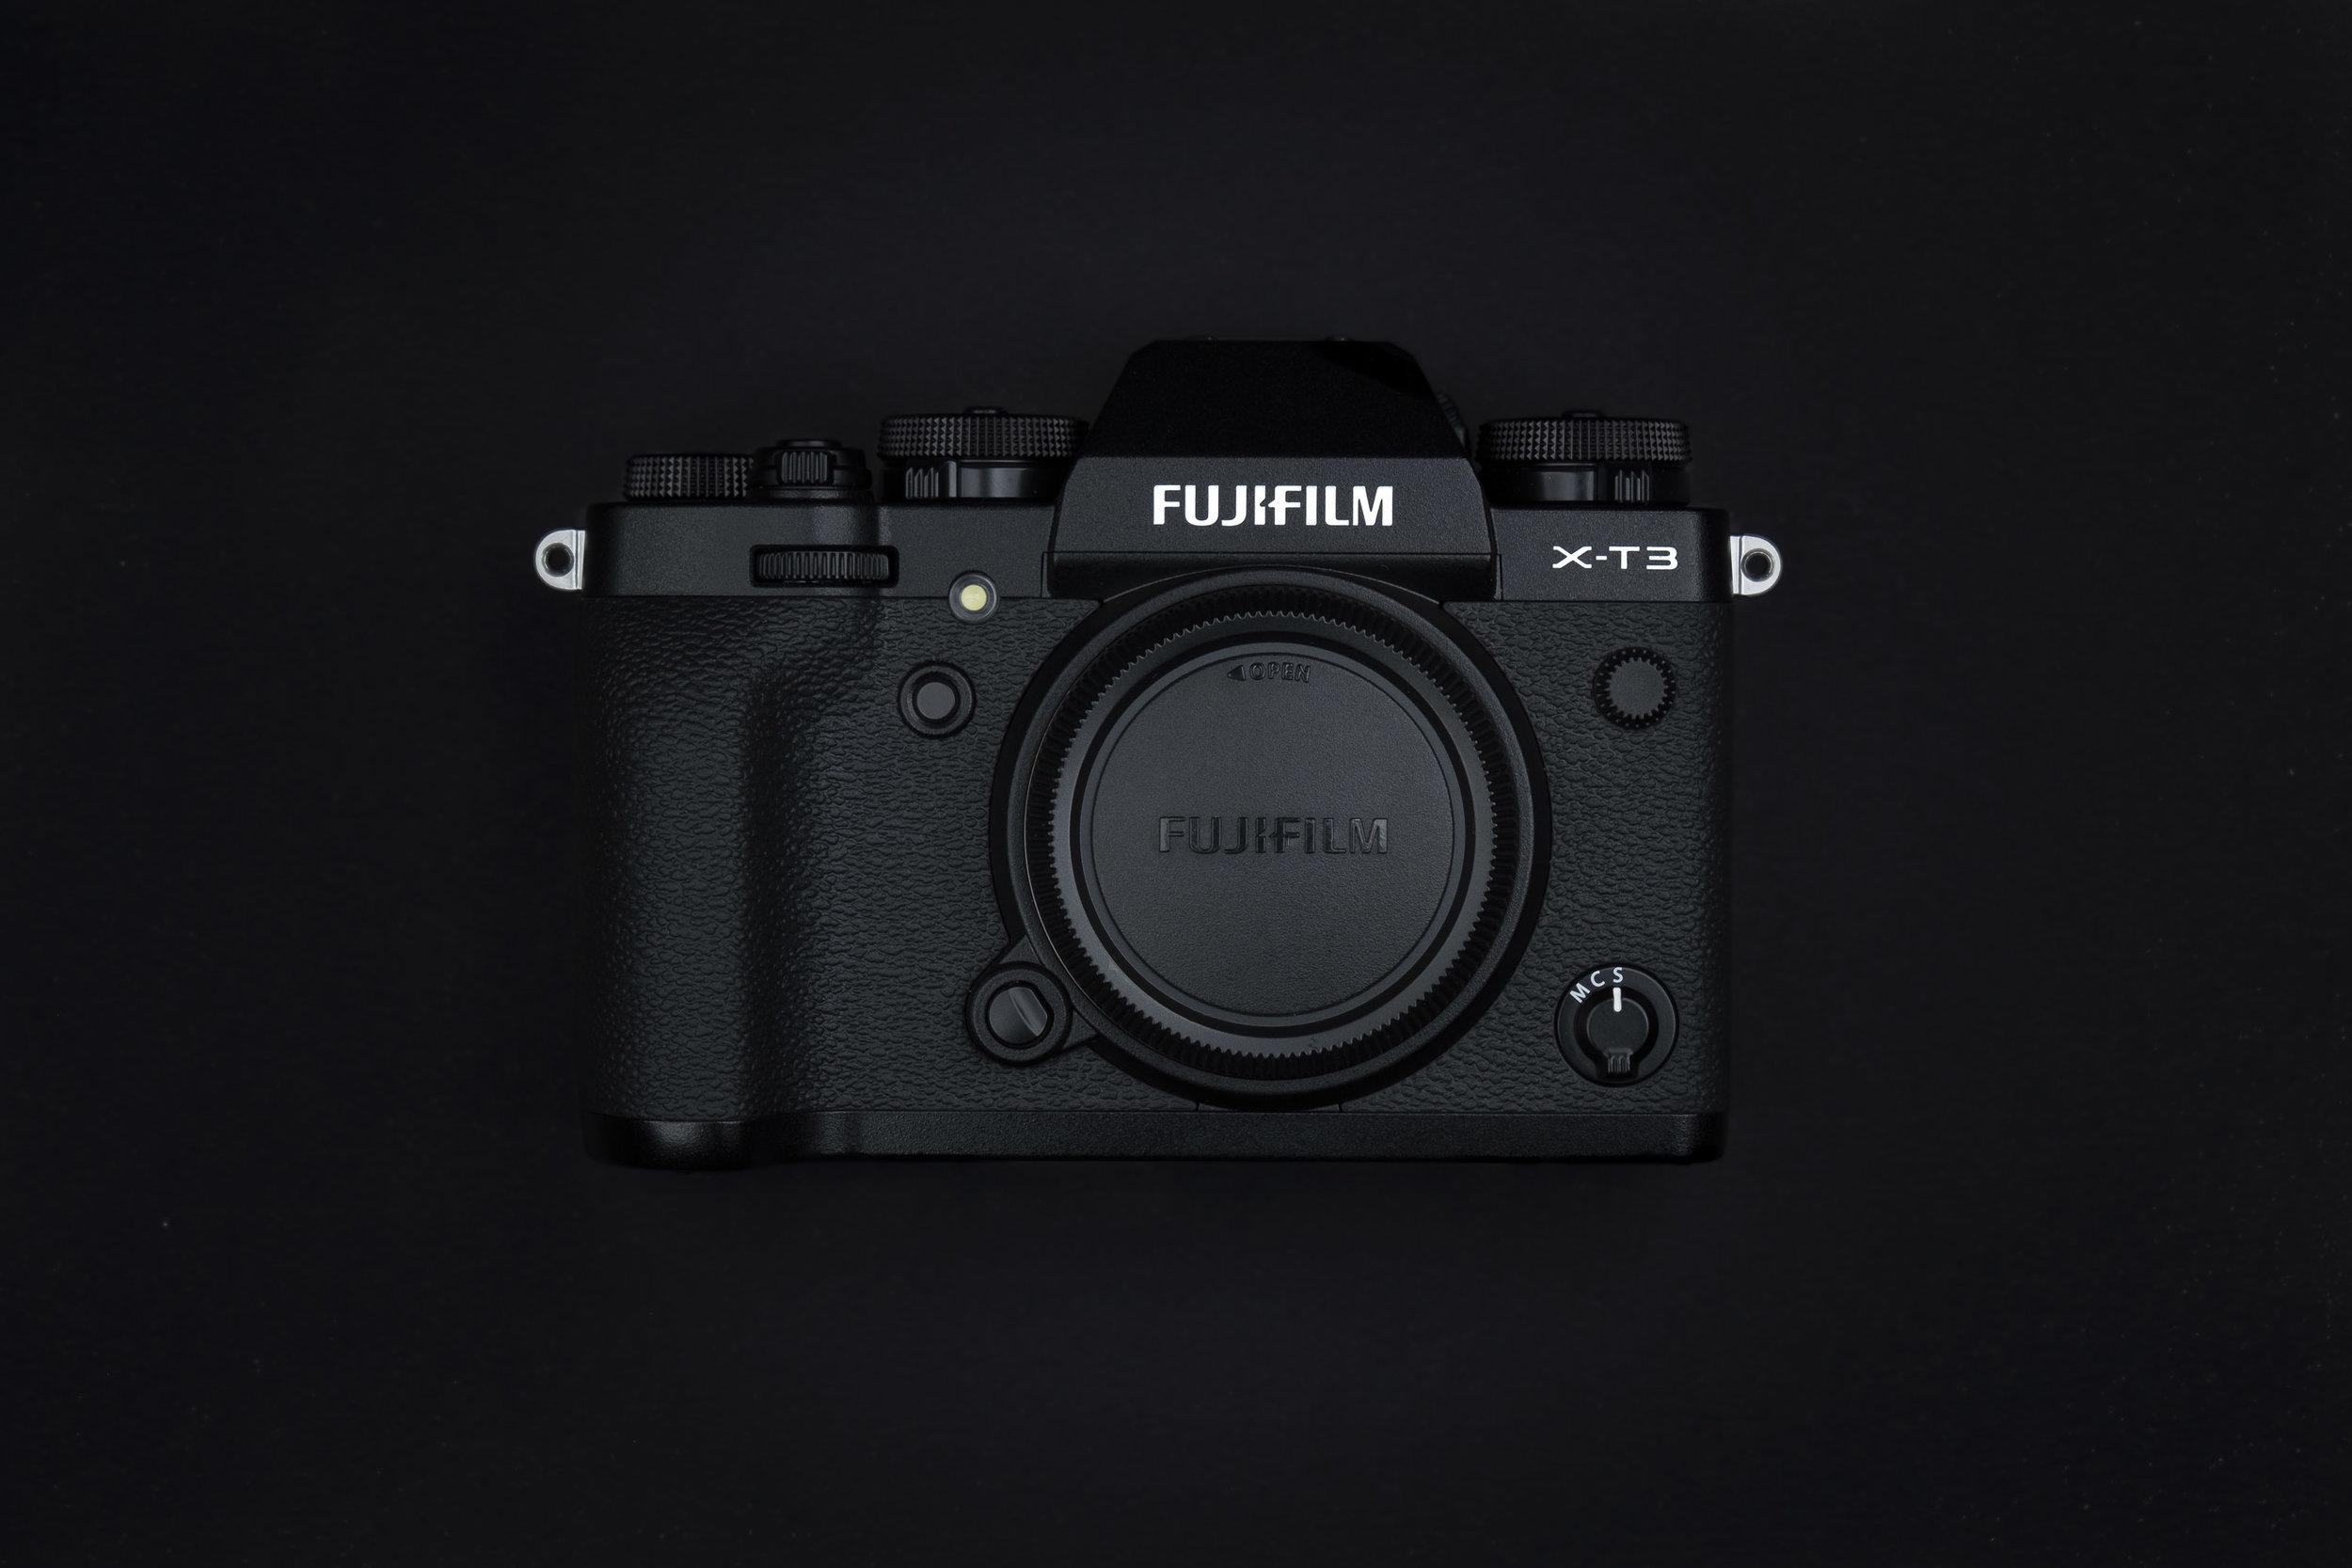 FUJIFILM-X-T3-REVIEW-CAMERA-lr-2.jpg